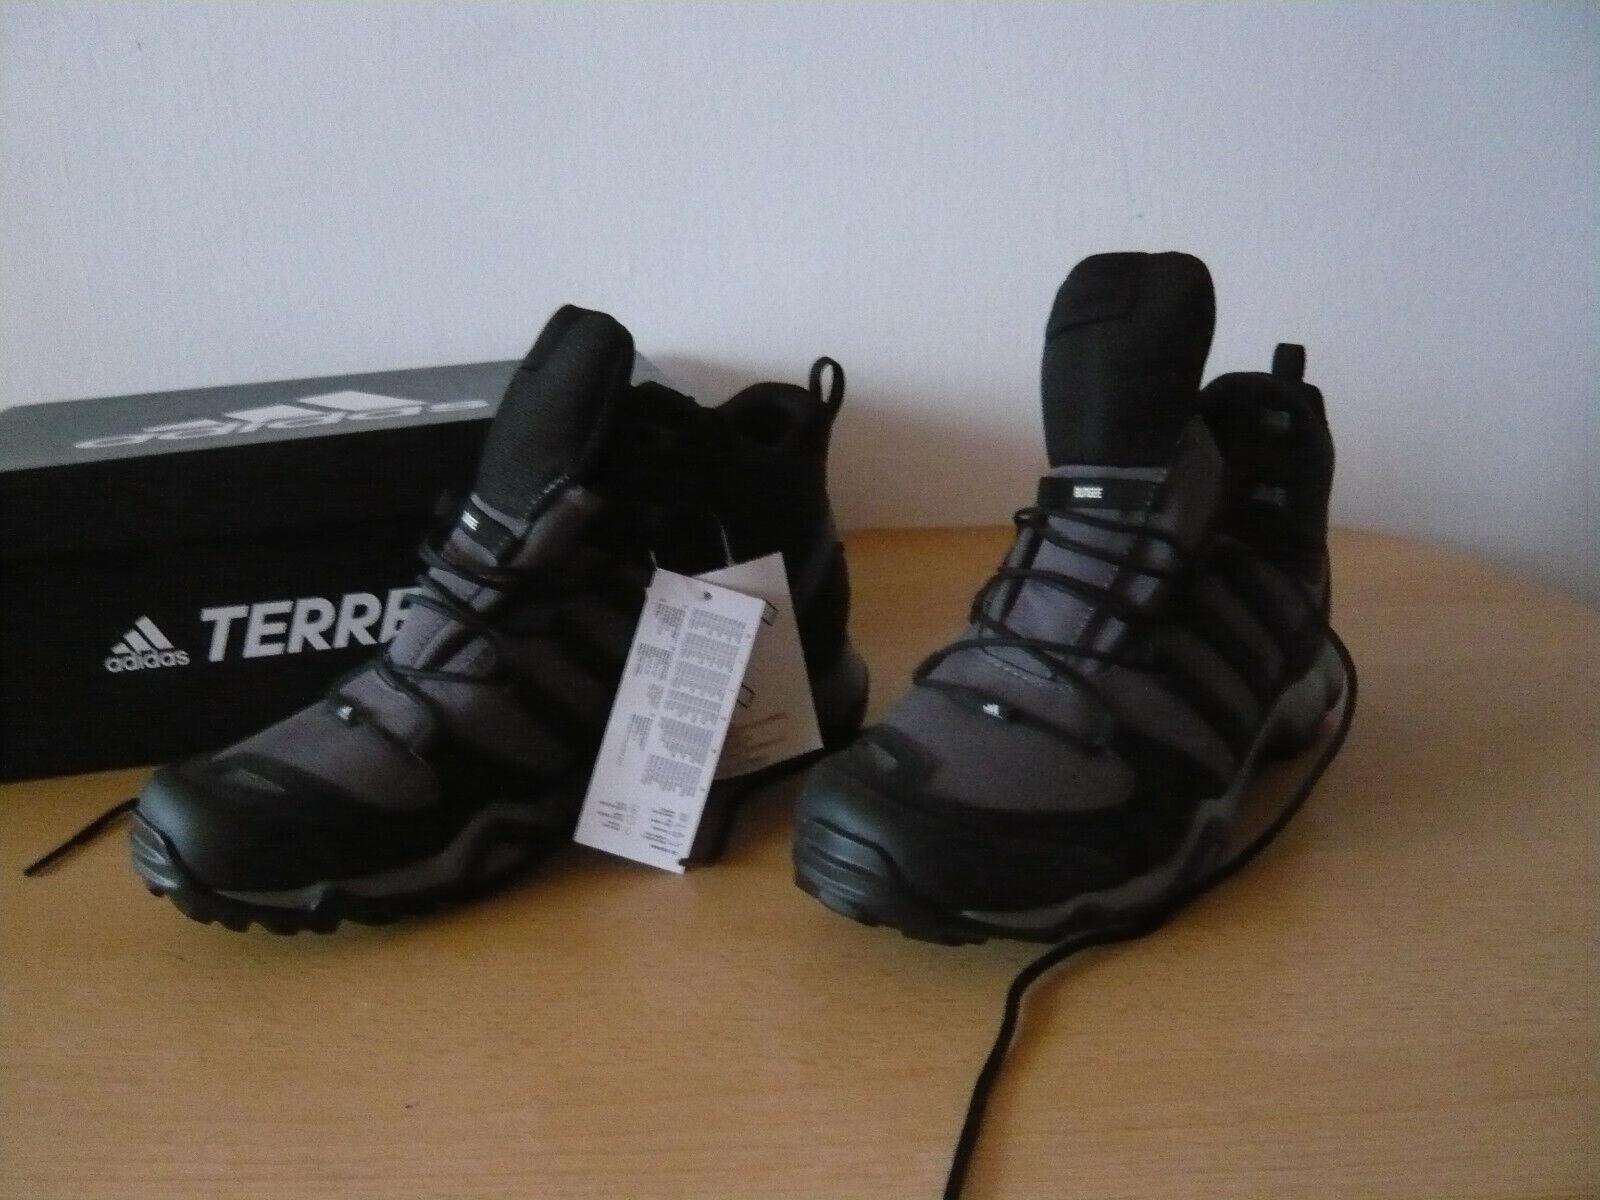 Adidas Terrex Swift R Mid Herren Stiefel Outdoor Schuhe Gr.44 Neu